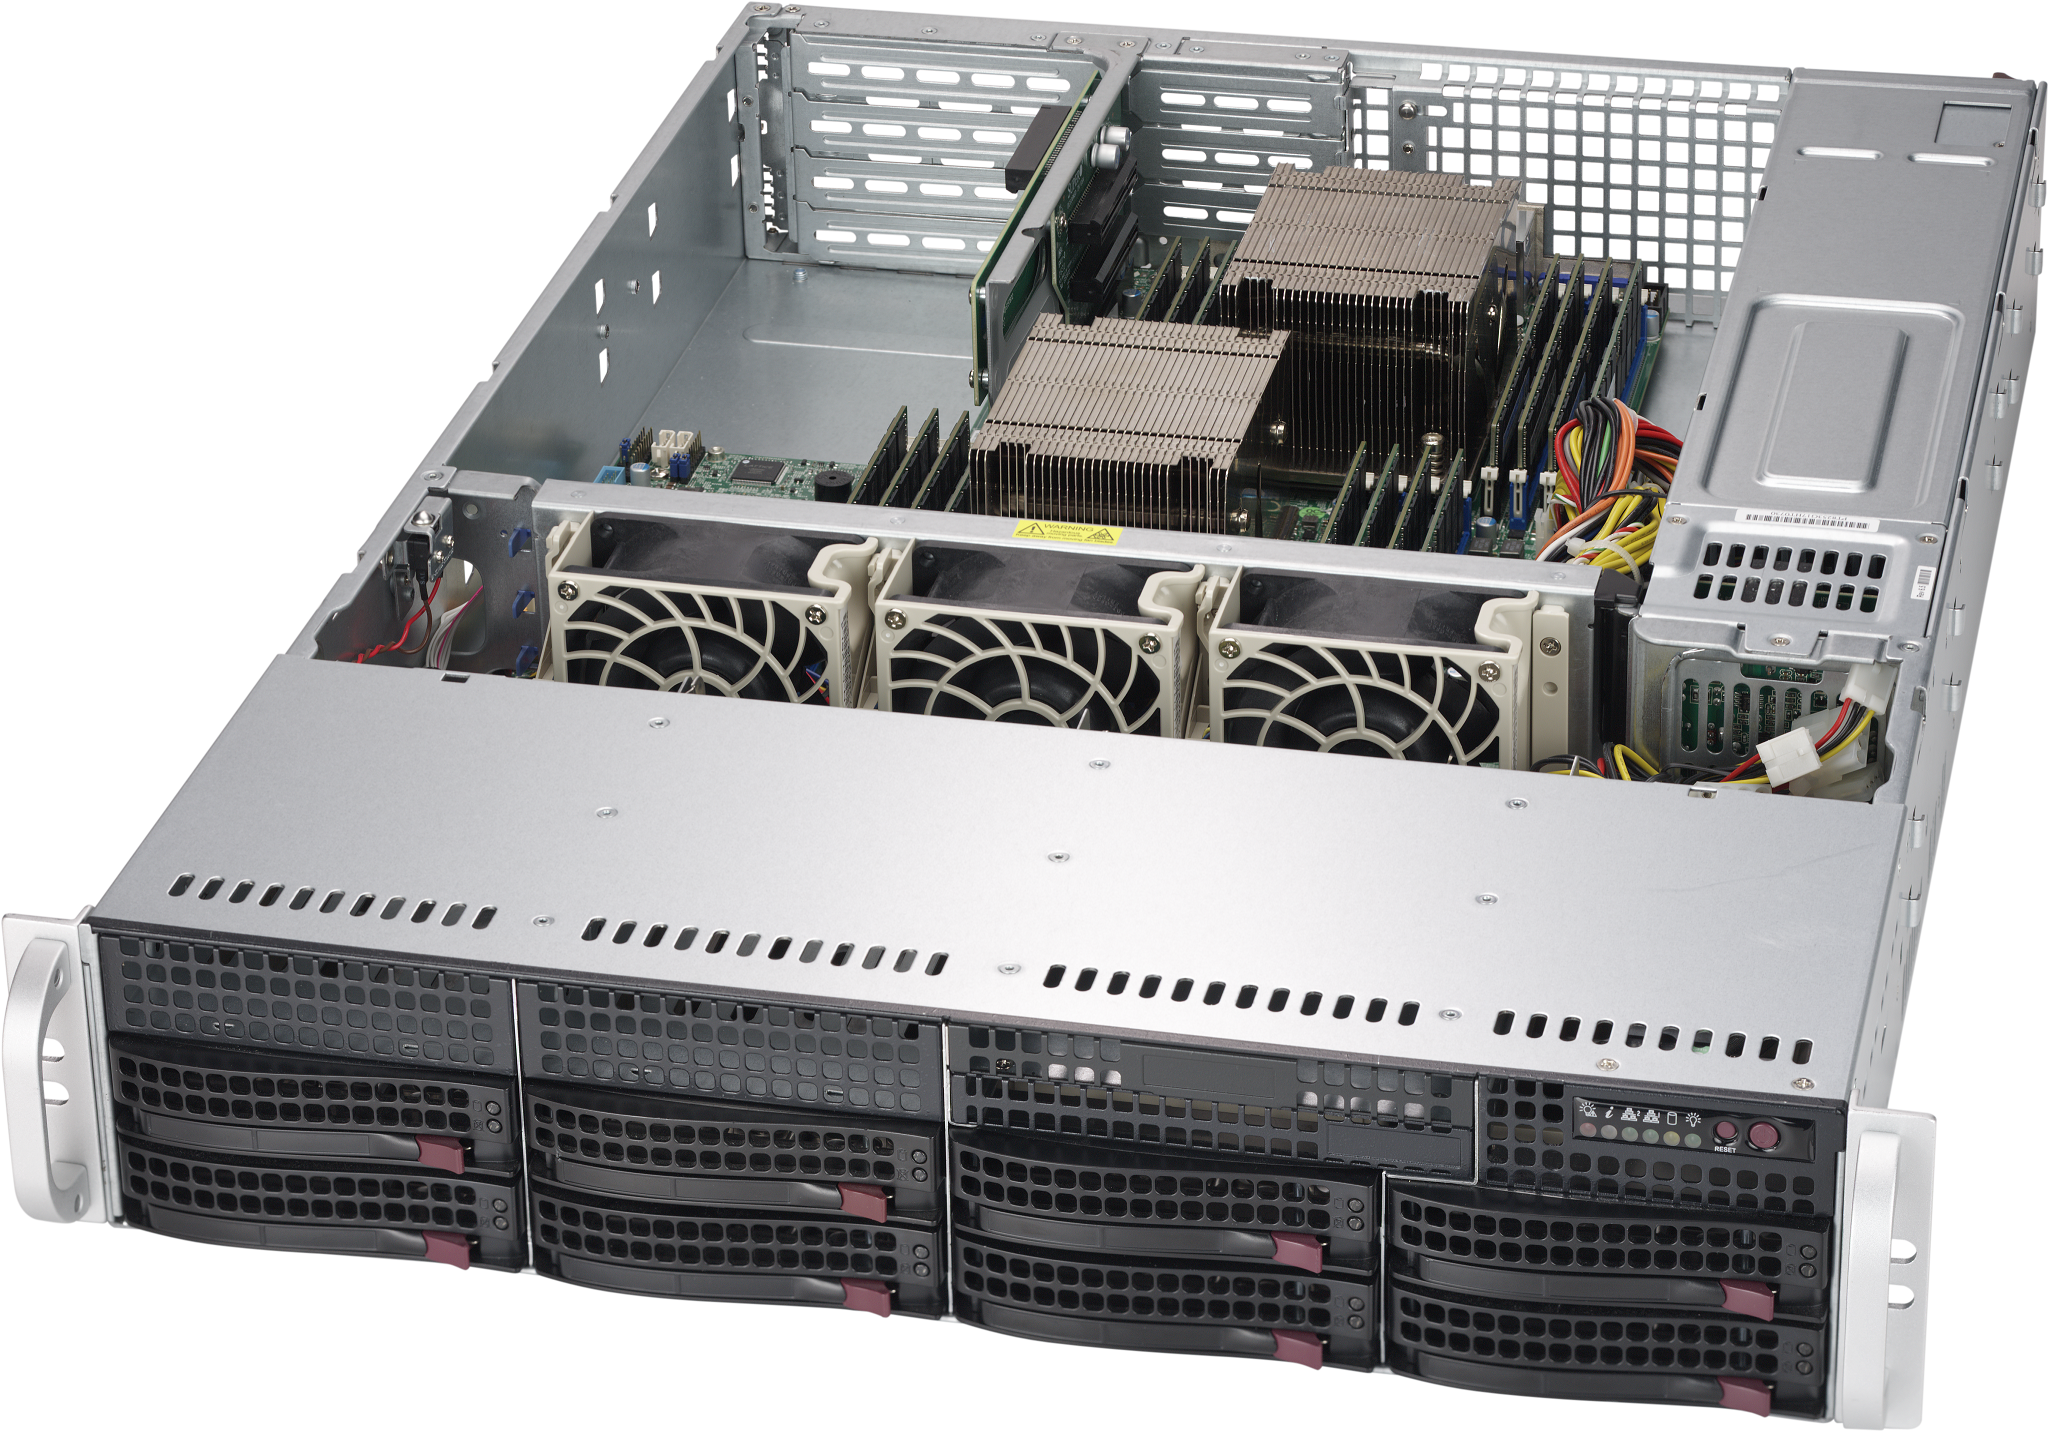 Серверный корпус SuperMicro CSE-825TQ-R500WB 2U E-ATX 13.68''x13' 8x3.5'' HotSwap SAS/SATA SES2 500В корпус серверный supermicro cse 825tq r720lpb cse 825tq r720lpb